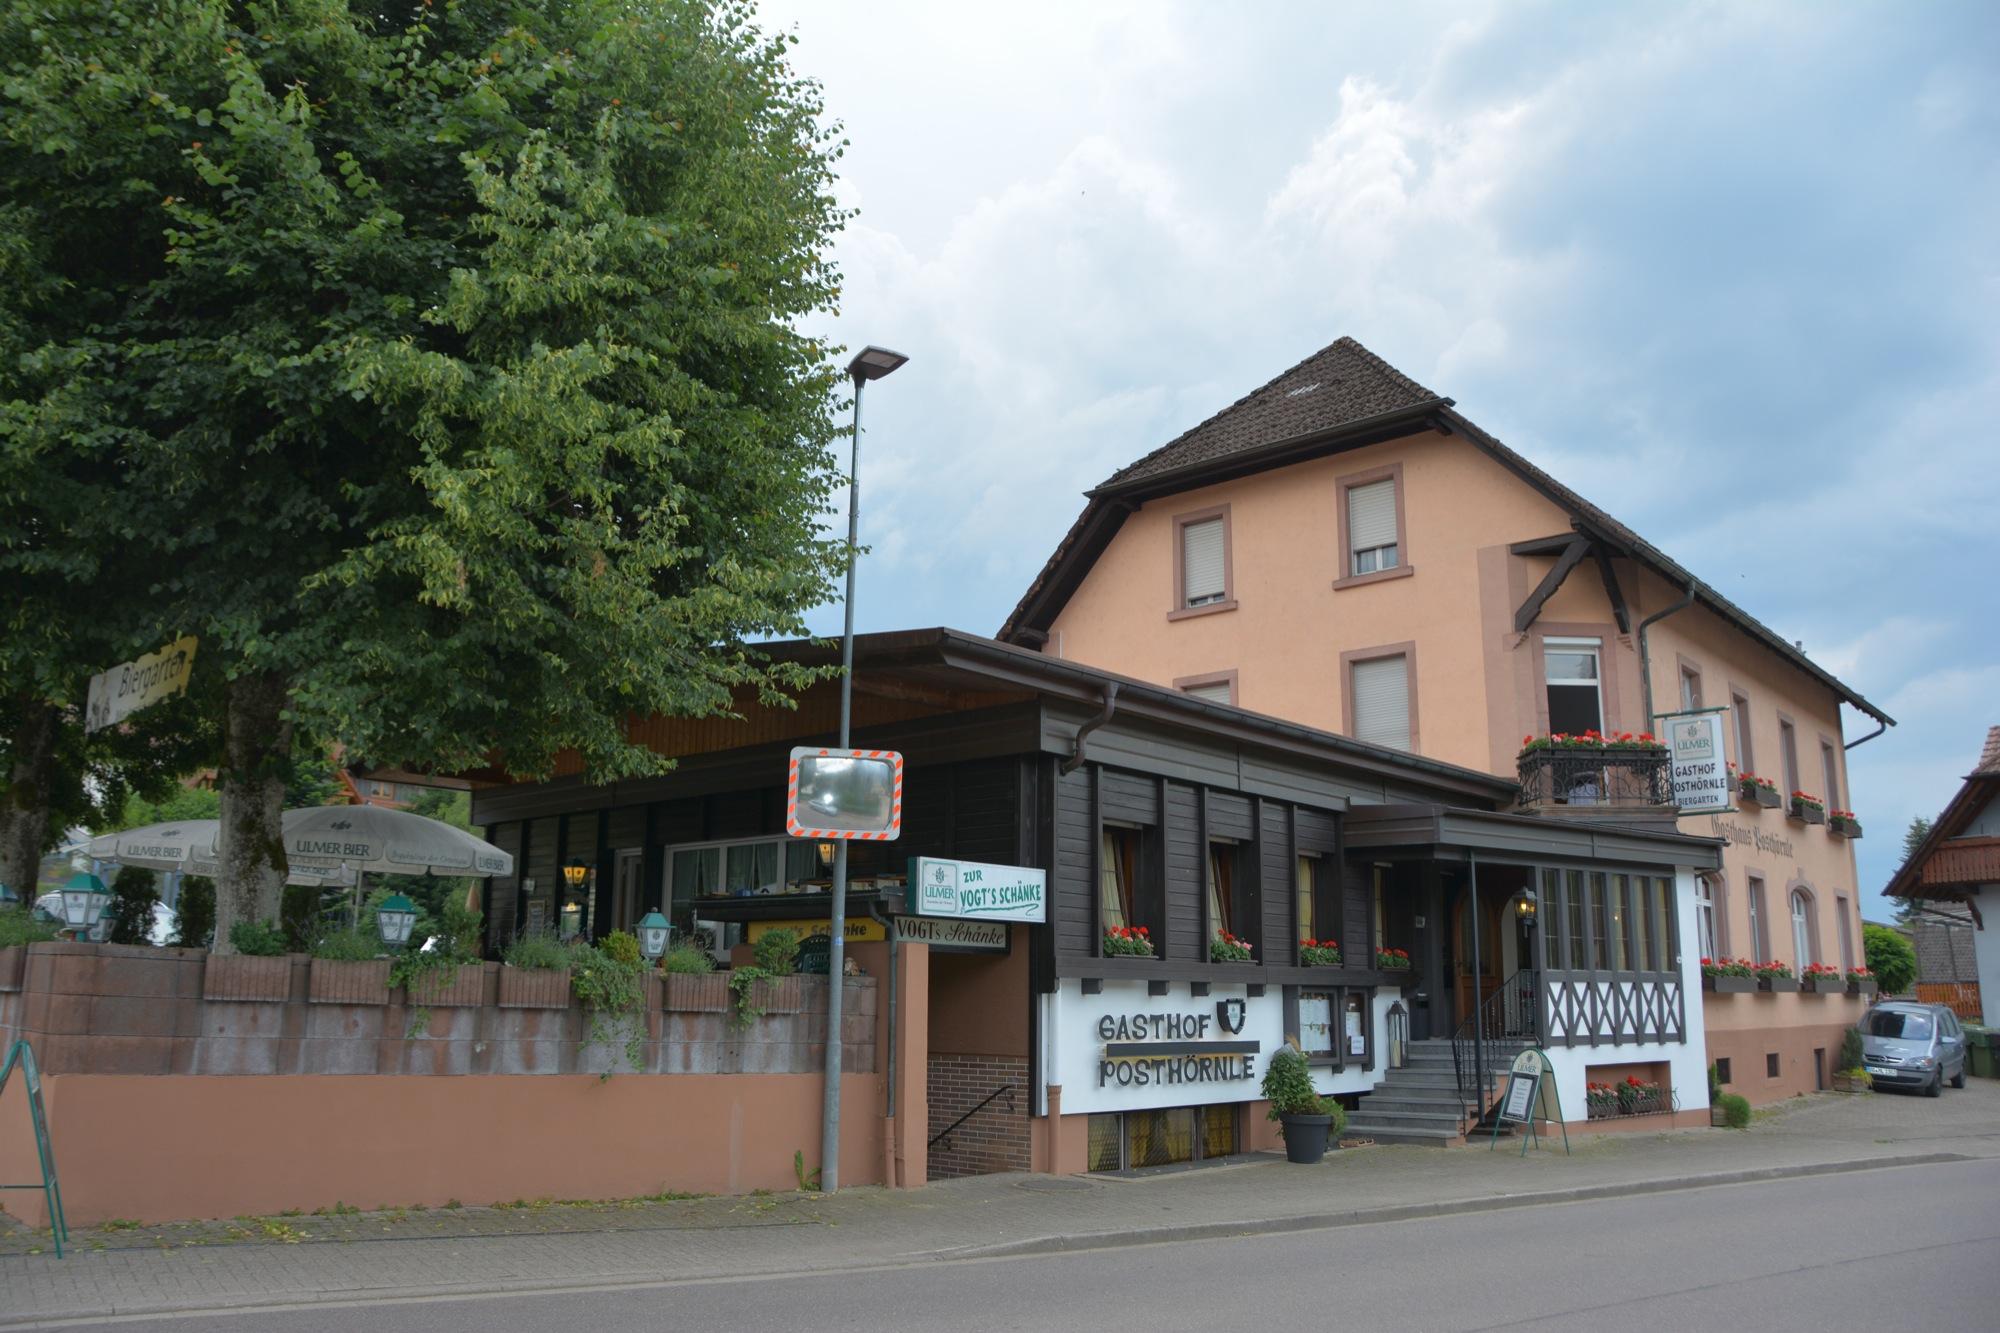 Posthörnle« ist nun im Besitz der Familie Lehmann | Schwarzwälder Post